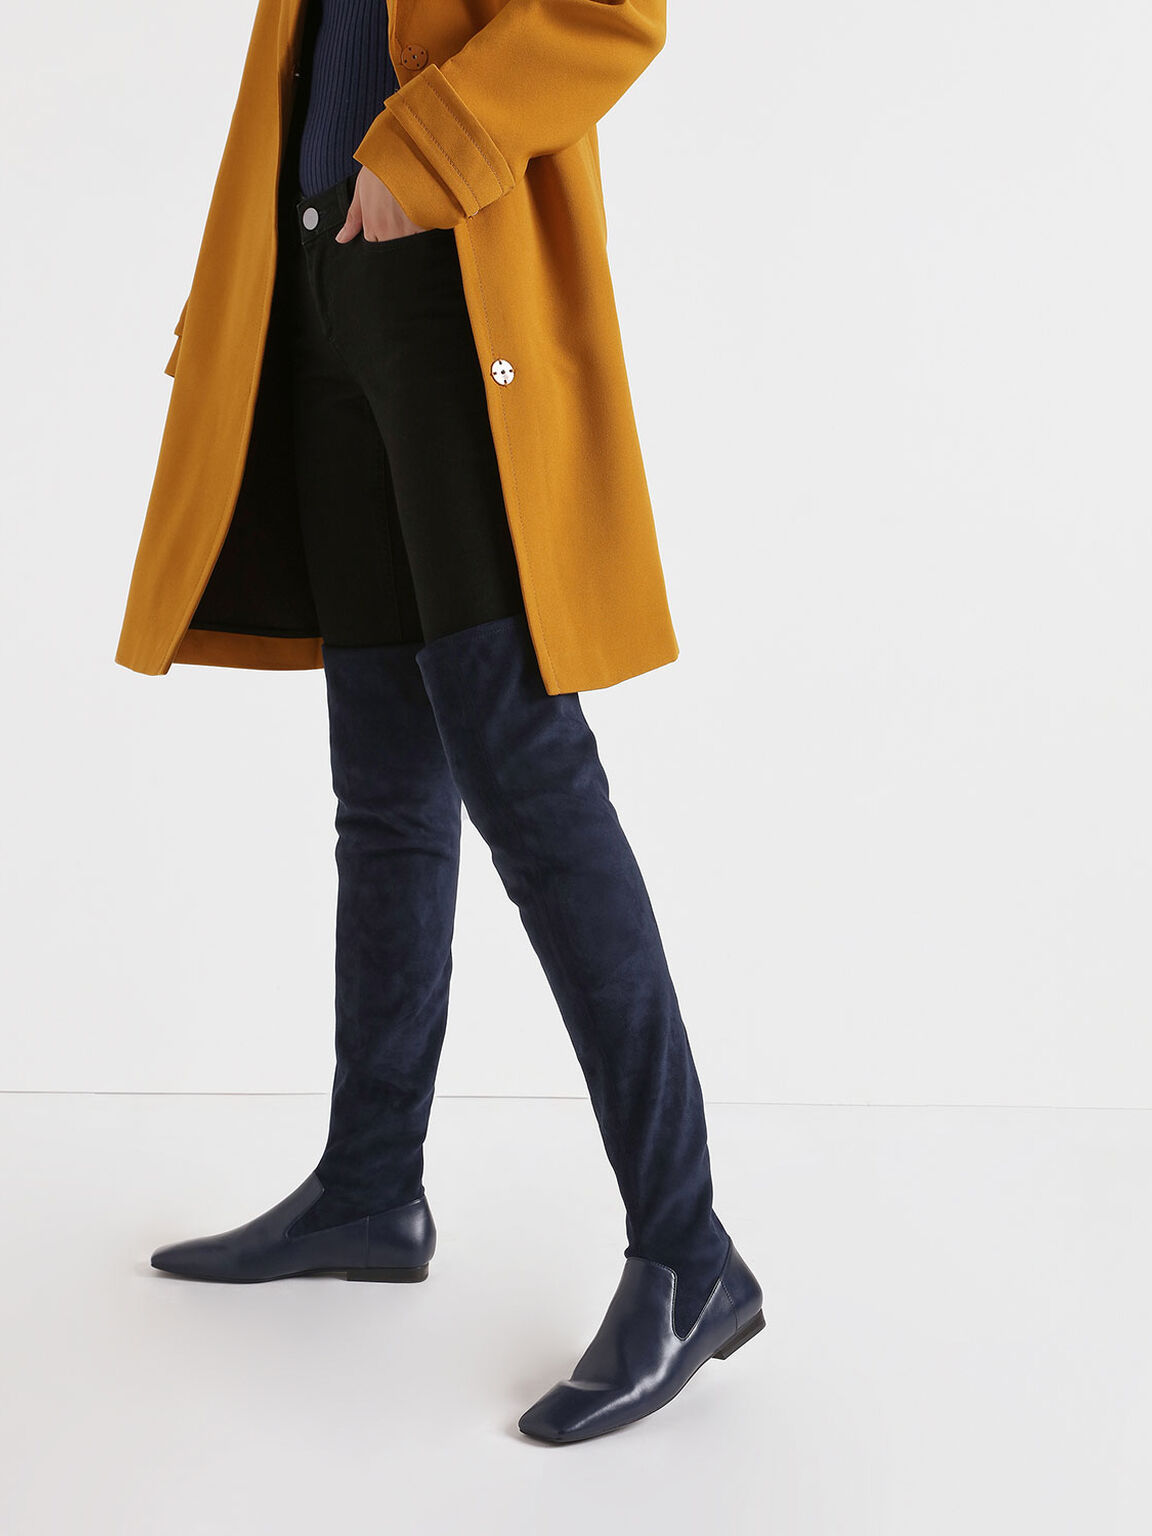 Thigh High Flat Sock Boots, Dark Blue, hi-res